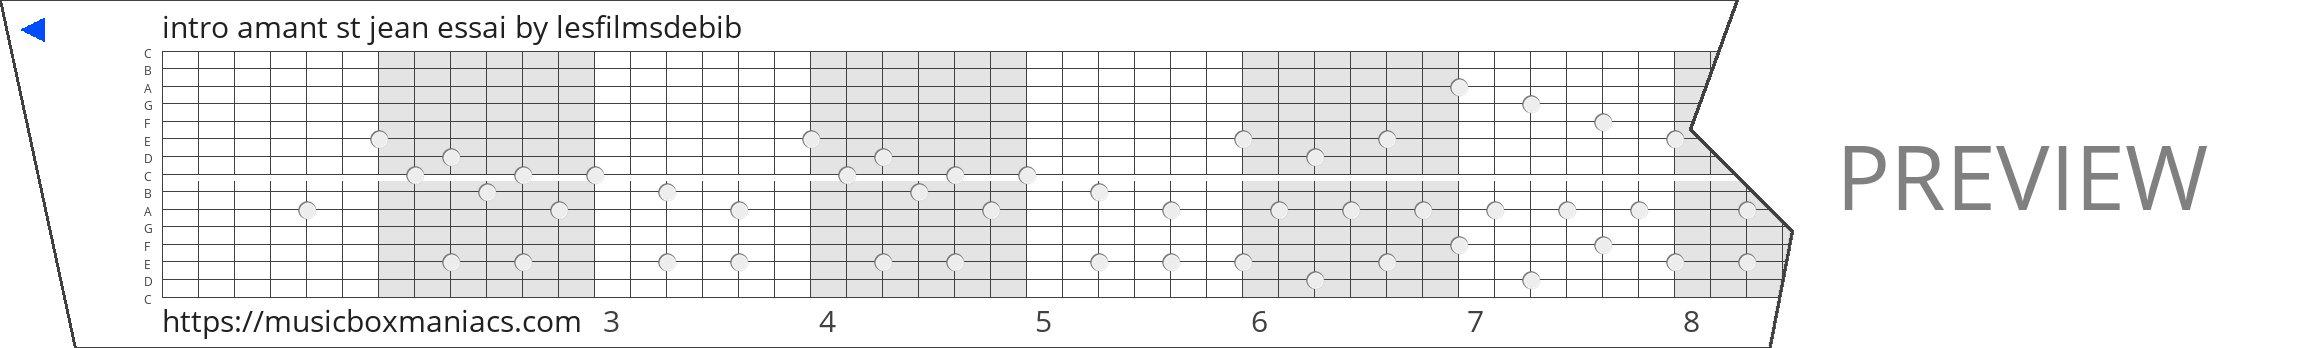 intro amant st jean essai 15 note music box paper strip